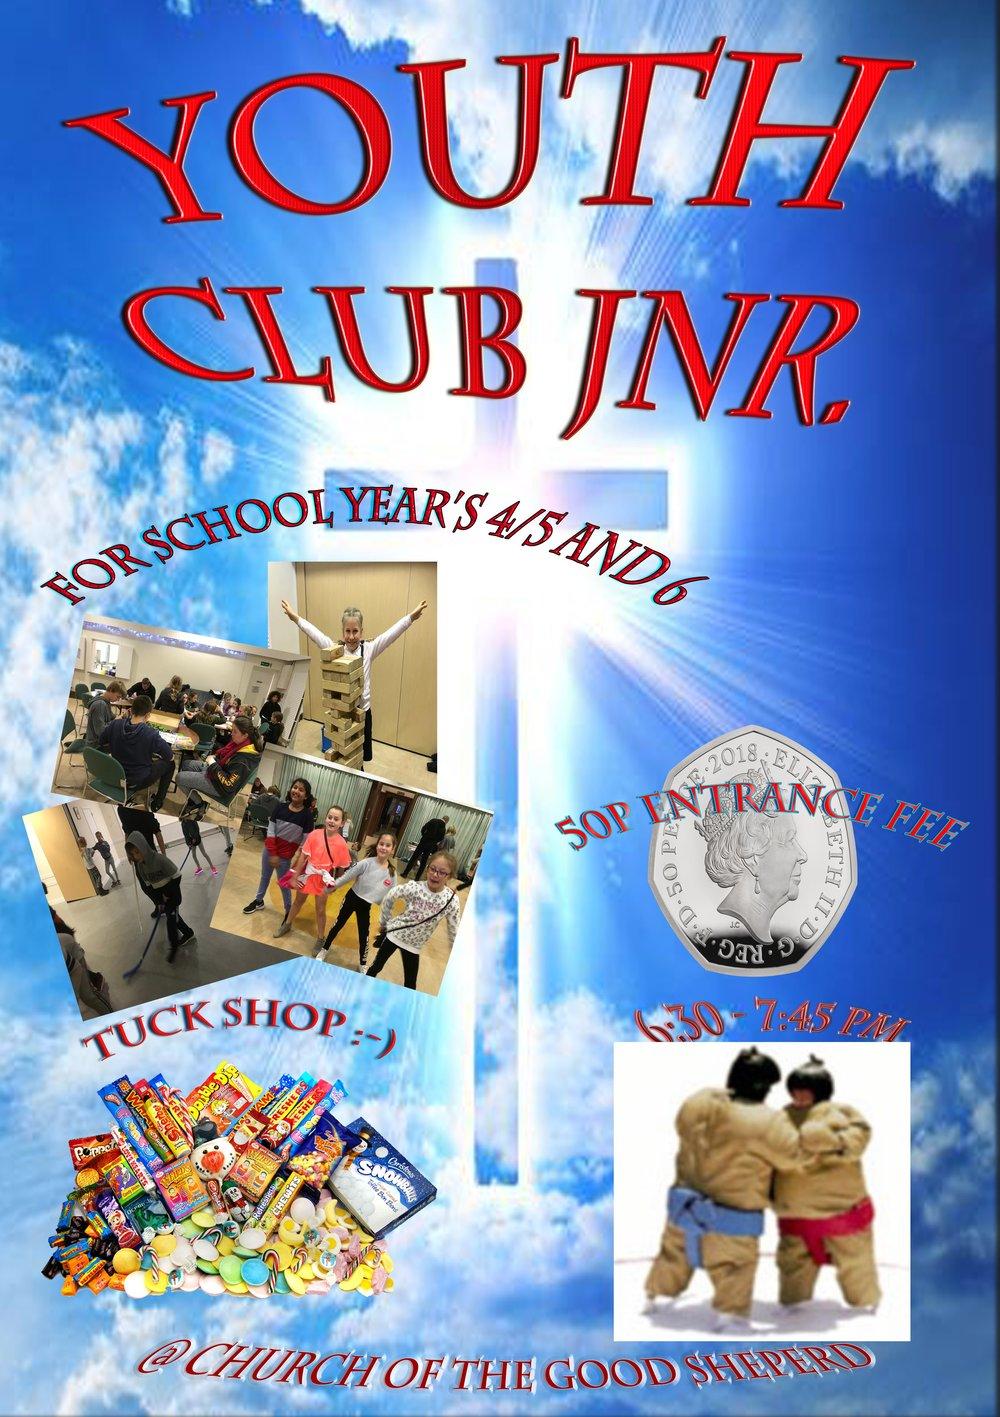 Youth Club Jnr..jpg